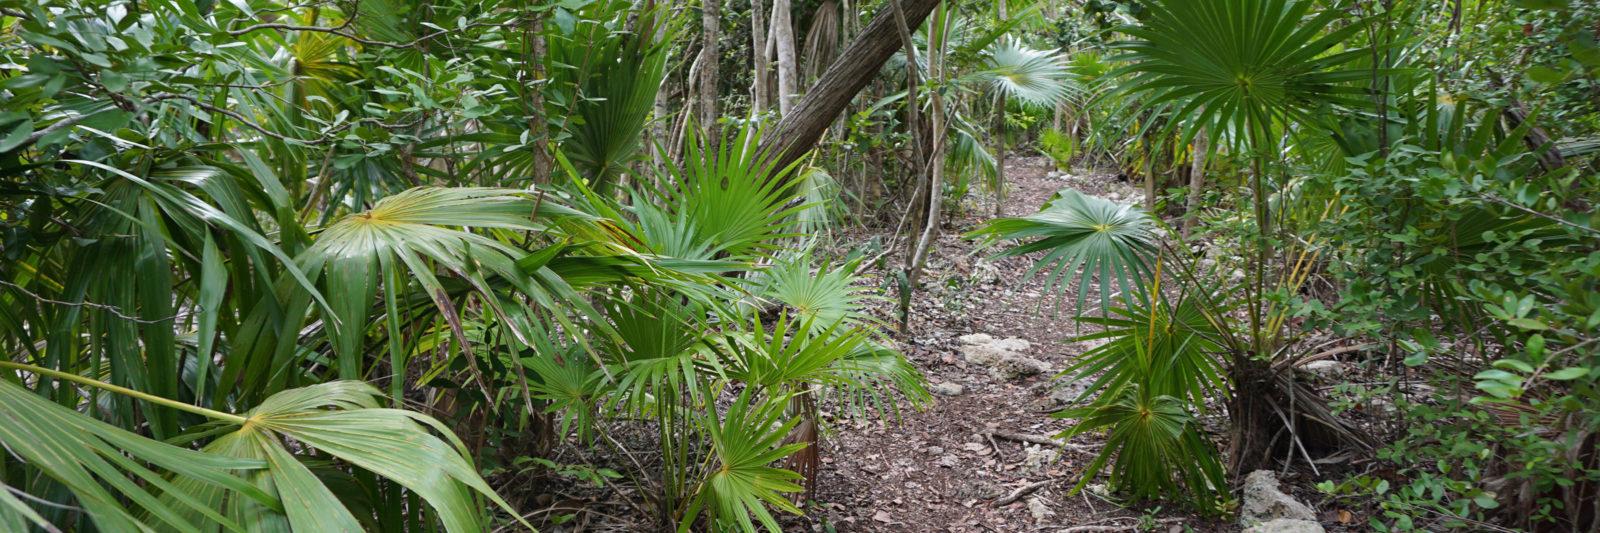 tropical forest Crane Point Hammock